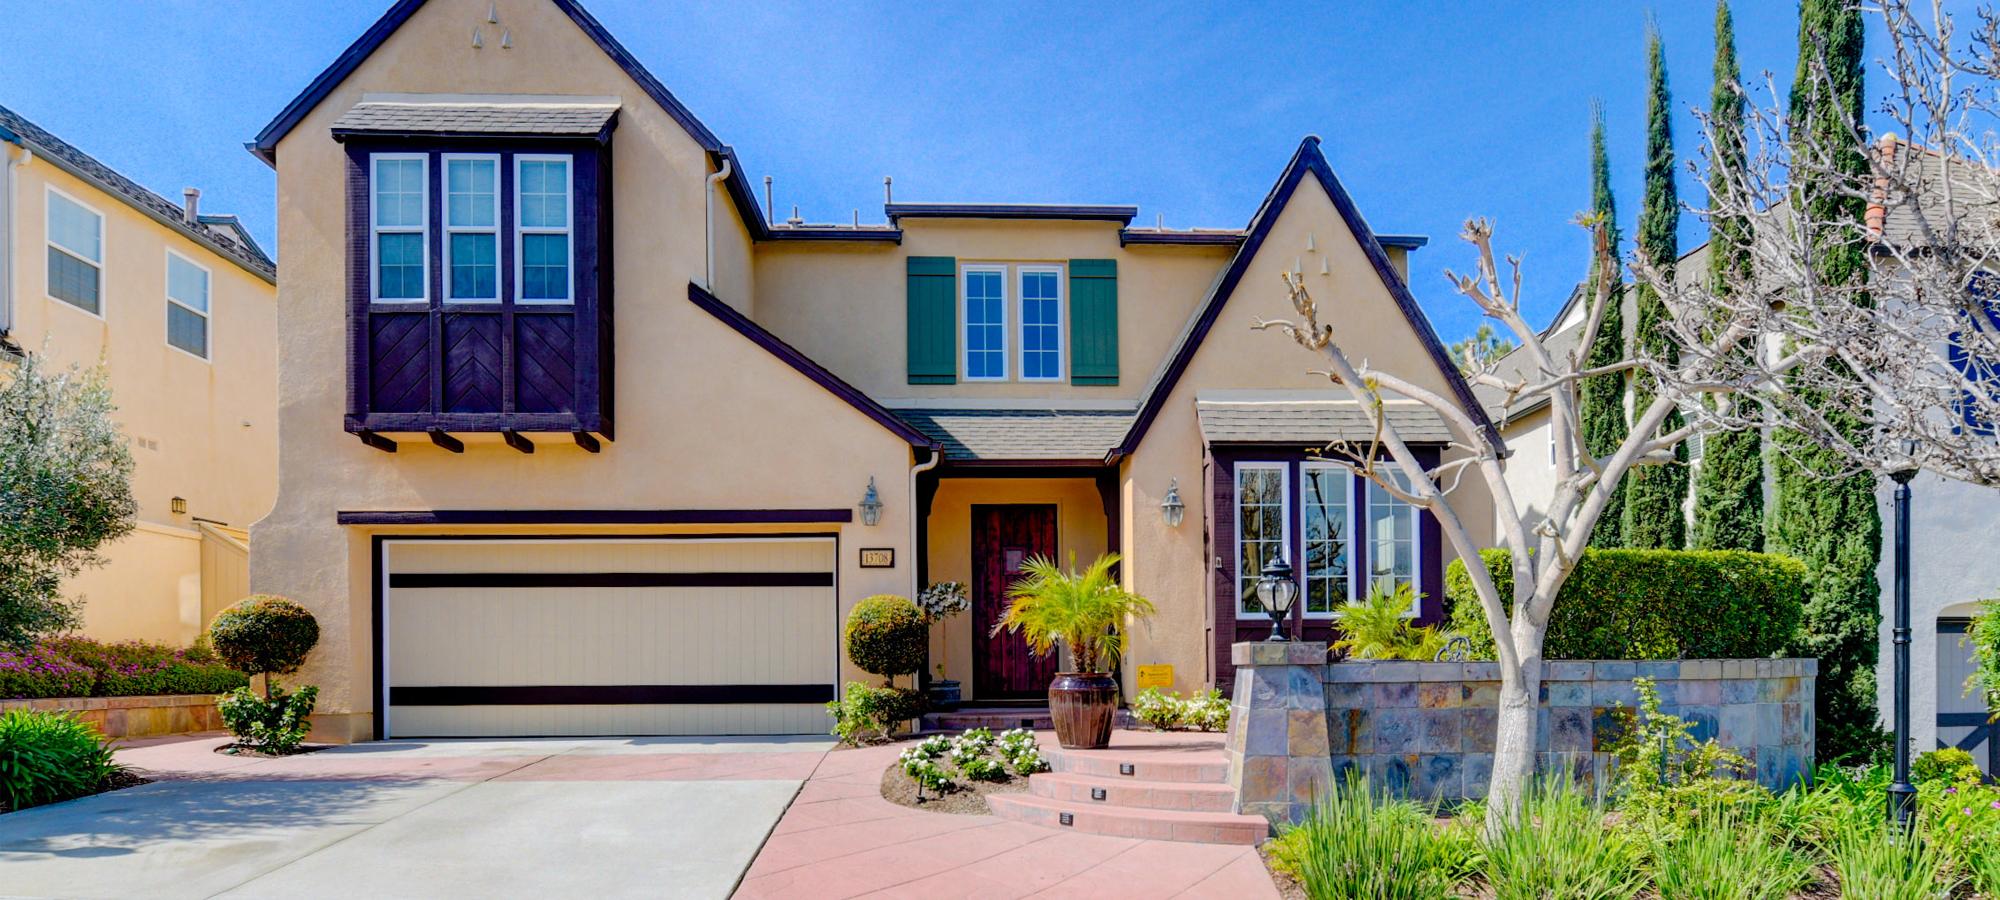 13708 Rosecroft Way San Diego, CA 92130